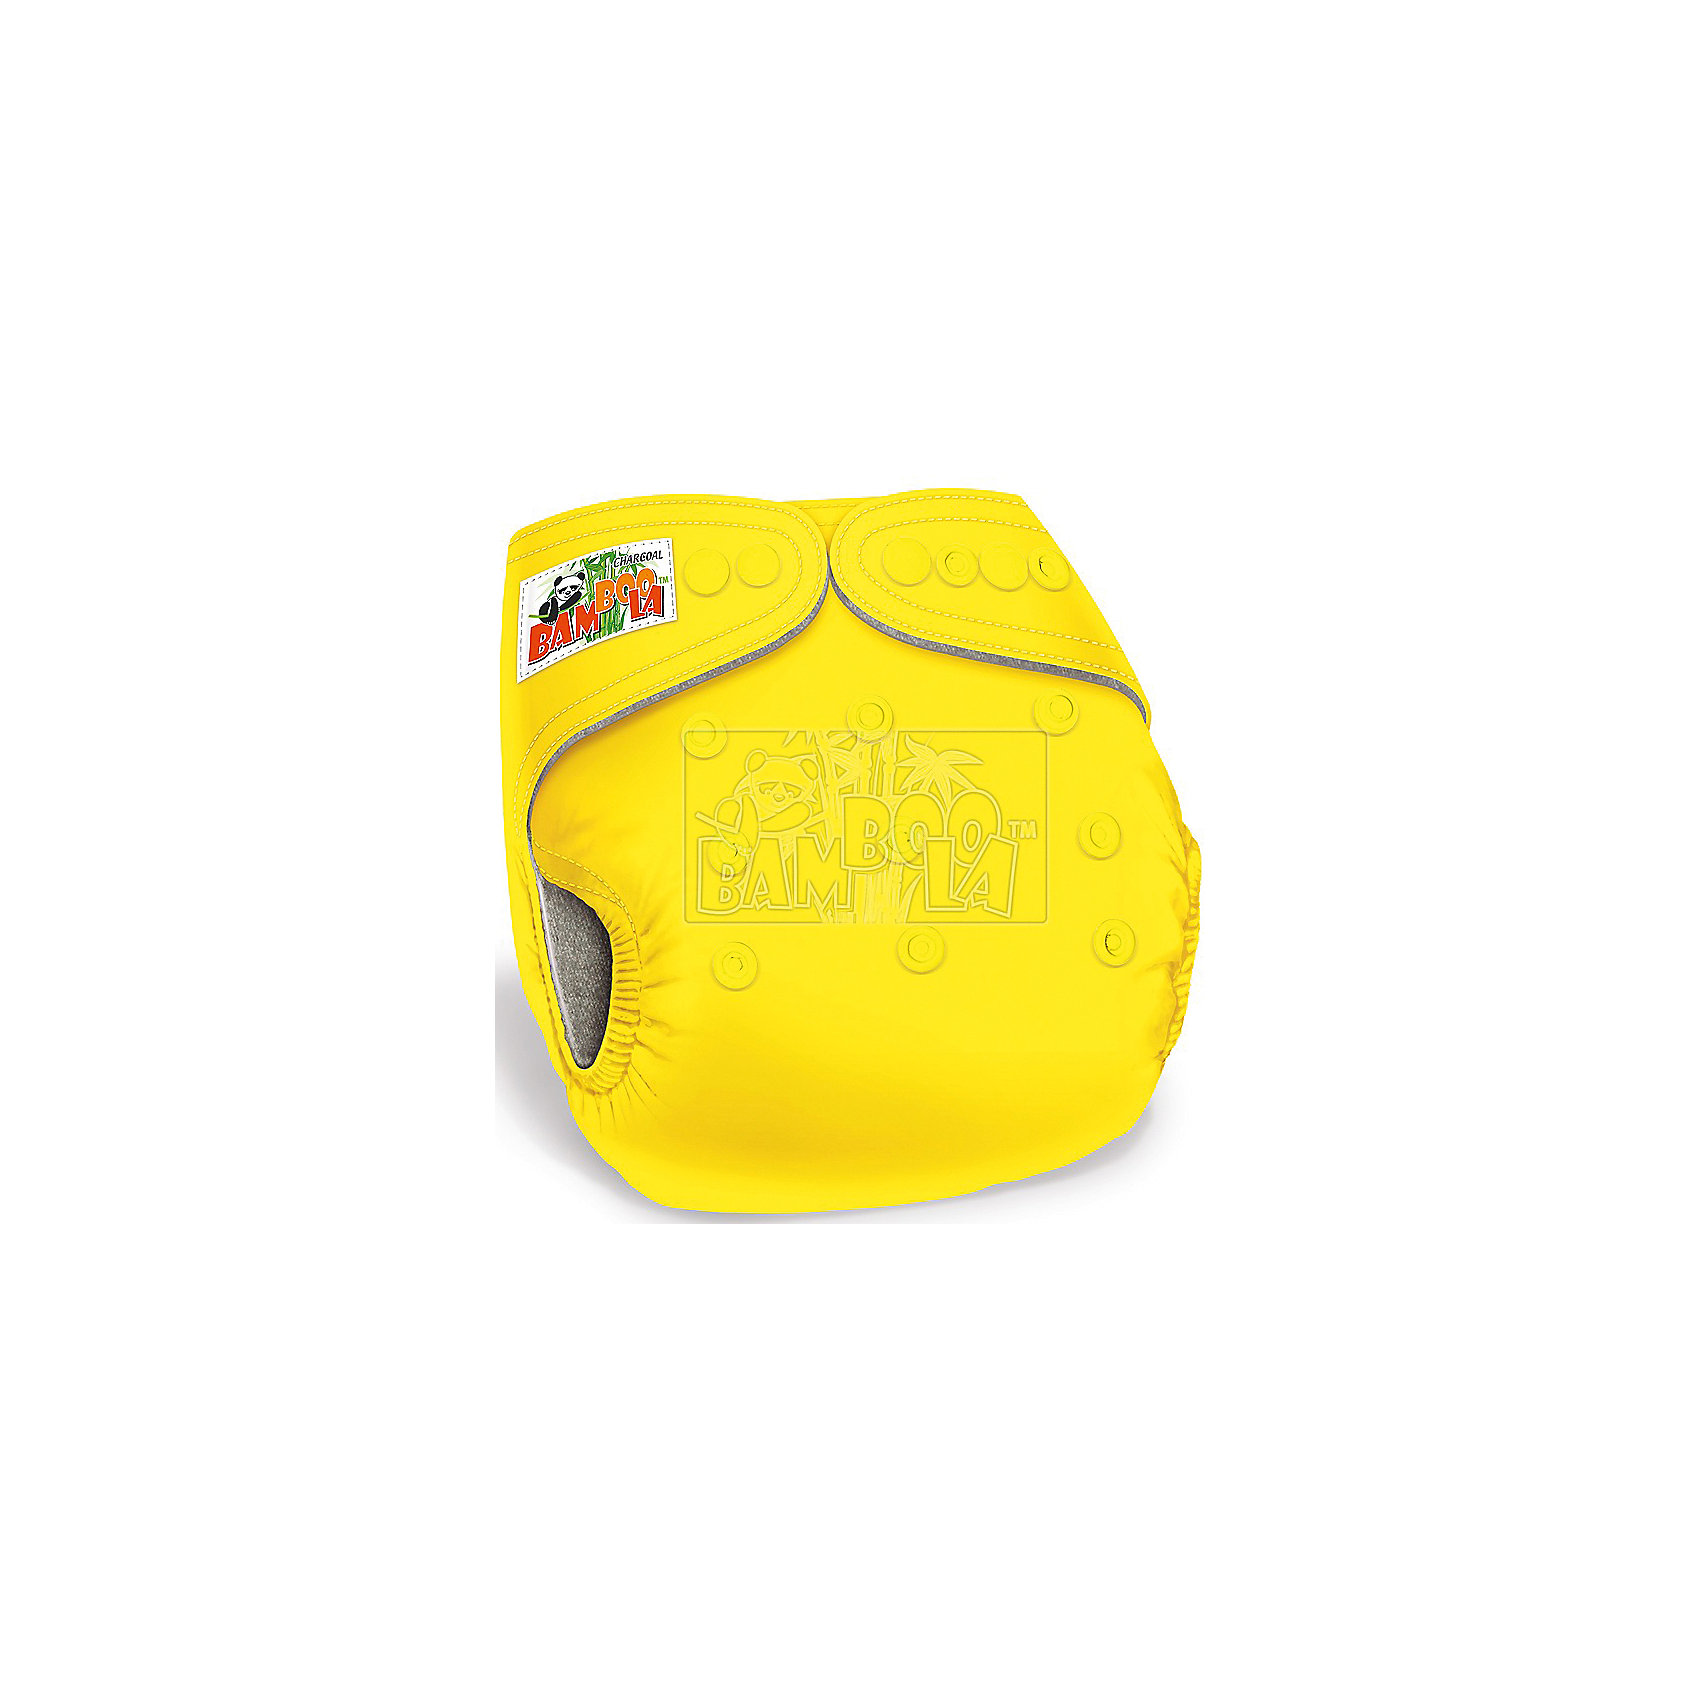 Многоразовый подгузник Bamboola Premium (Bamboo), 3-16 кг., Multi Diapers, жёлтый